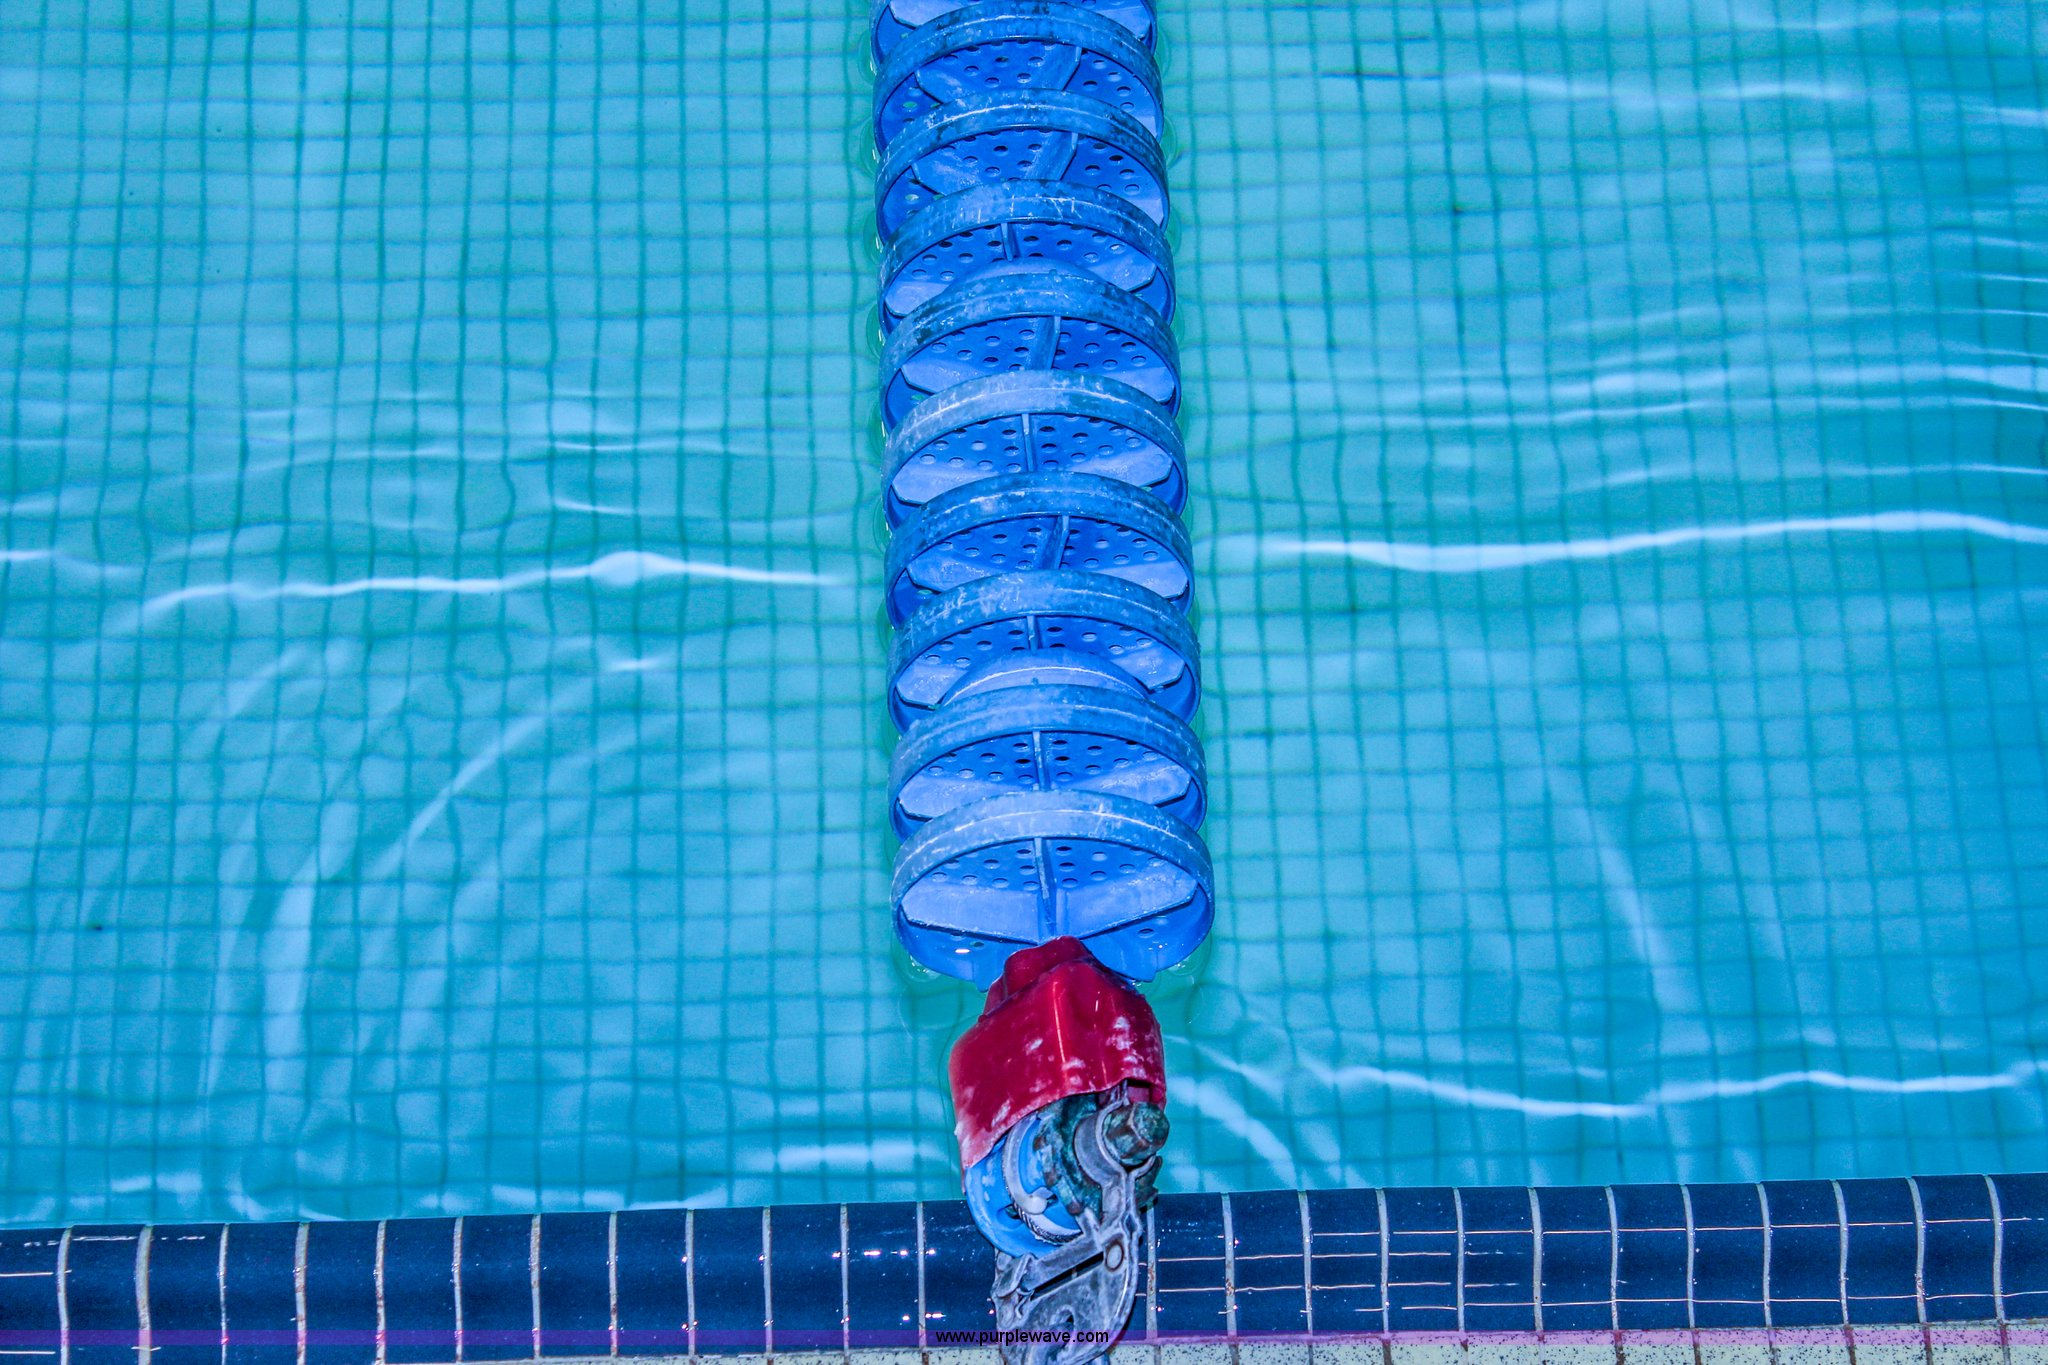 8) swimming pool lane lines | Item D1493 | SOLD! June 2 Gov...